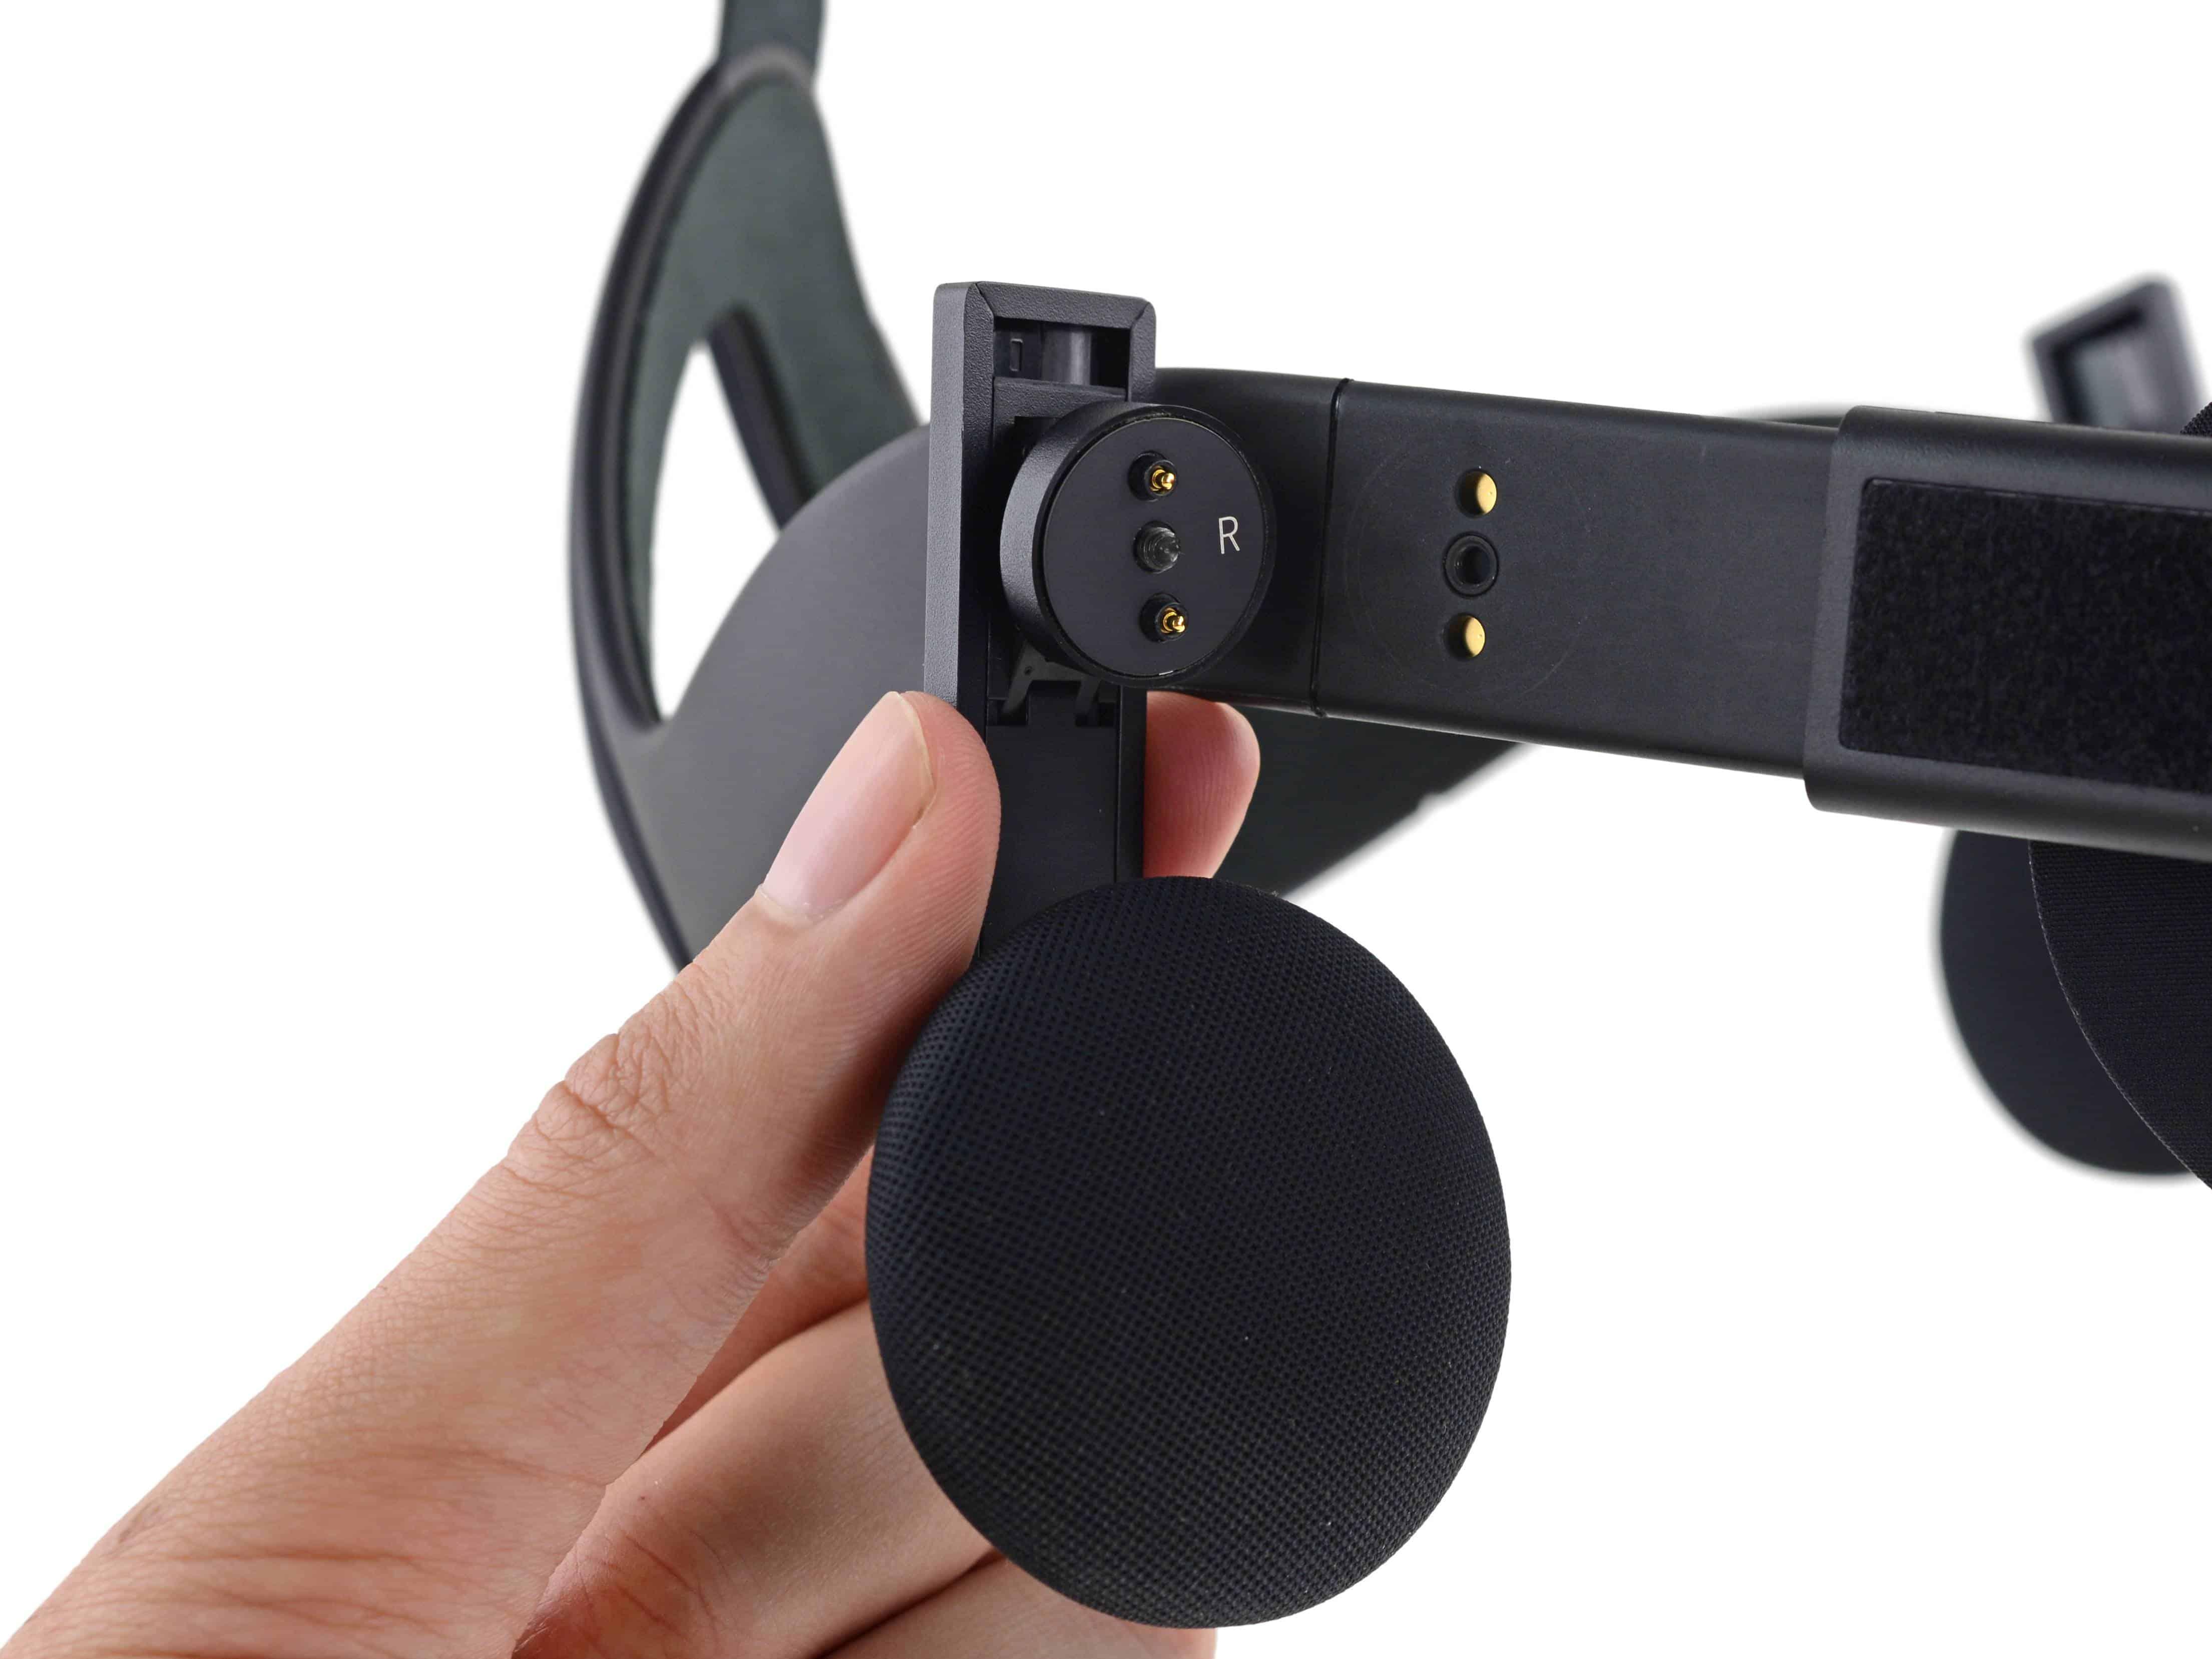 Oculus Rift Teardown 5